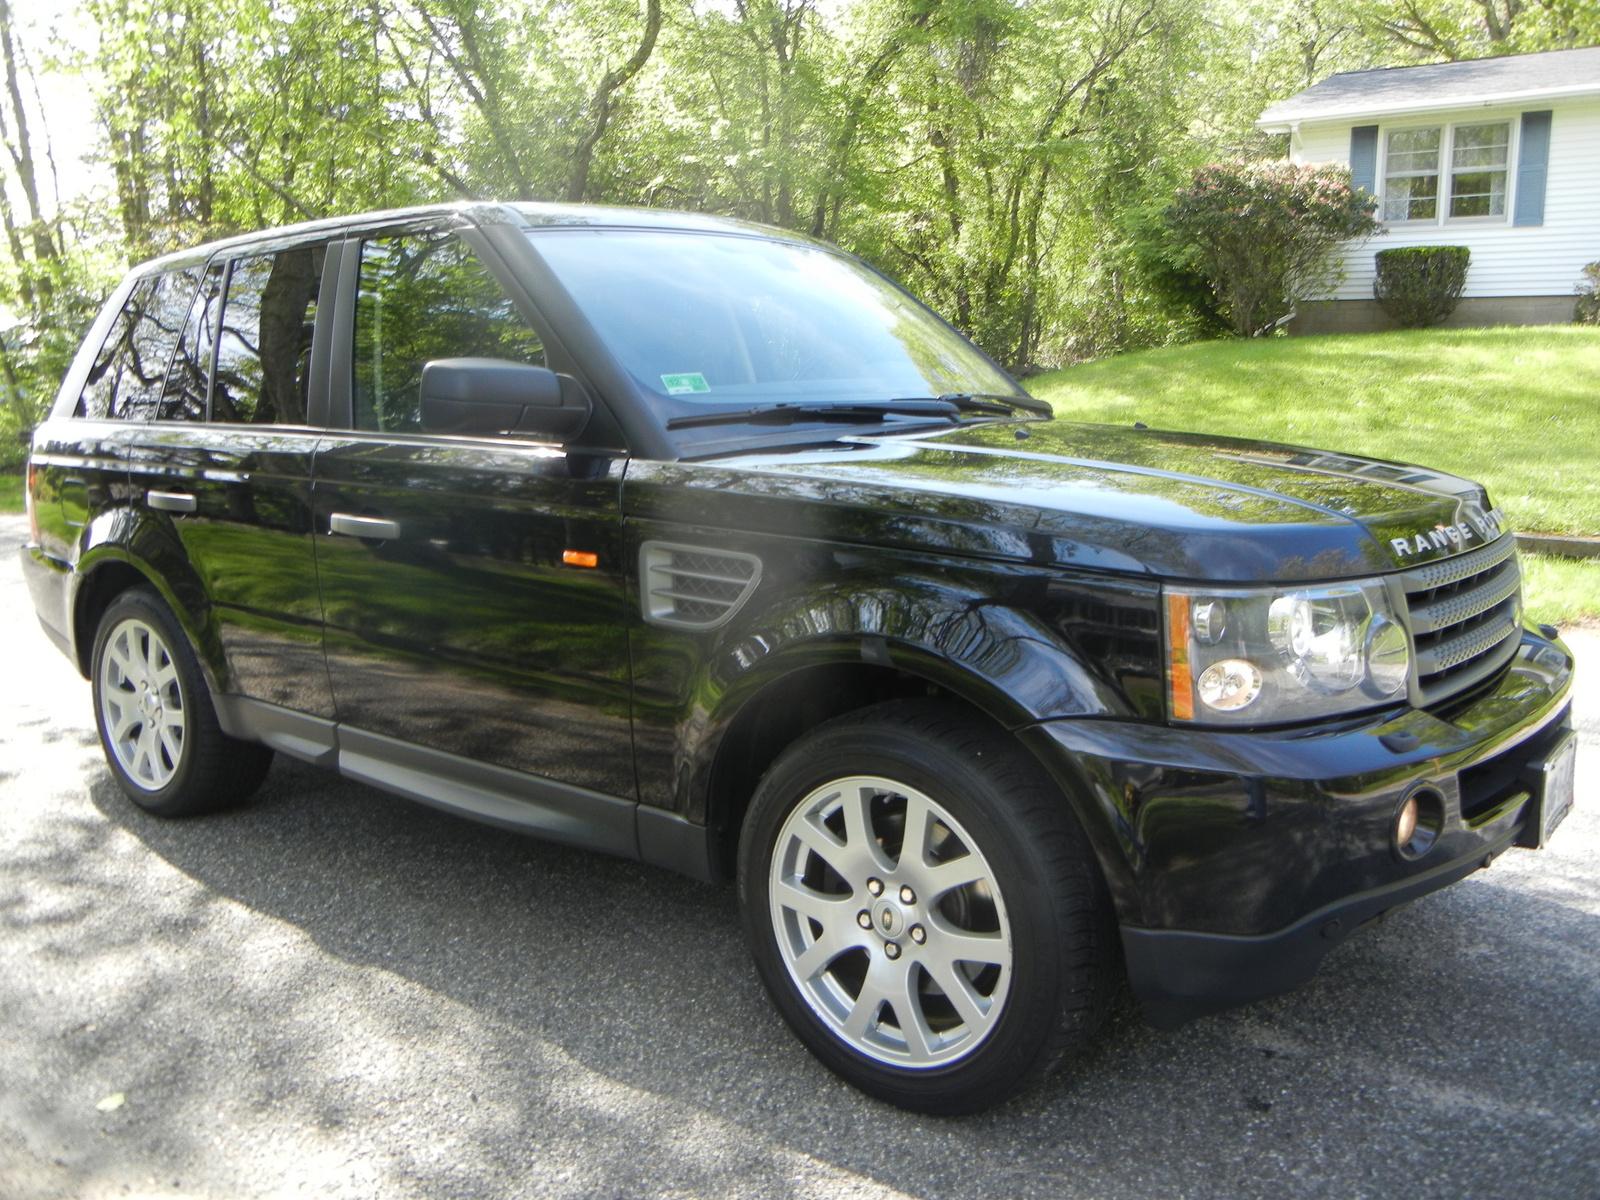 2008 land rover range rover sport exterior pictures cargurus. Black Bedroom Furniture Sets. Home Design Ideas